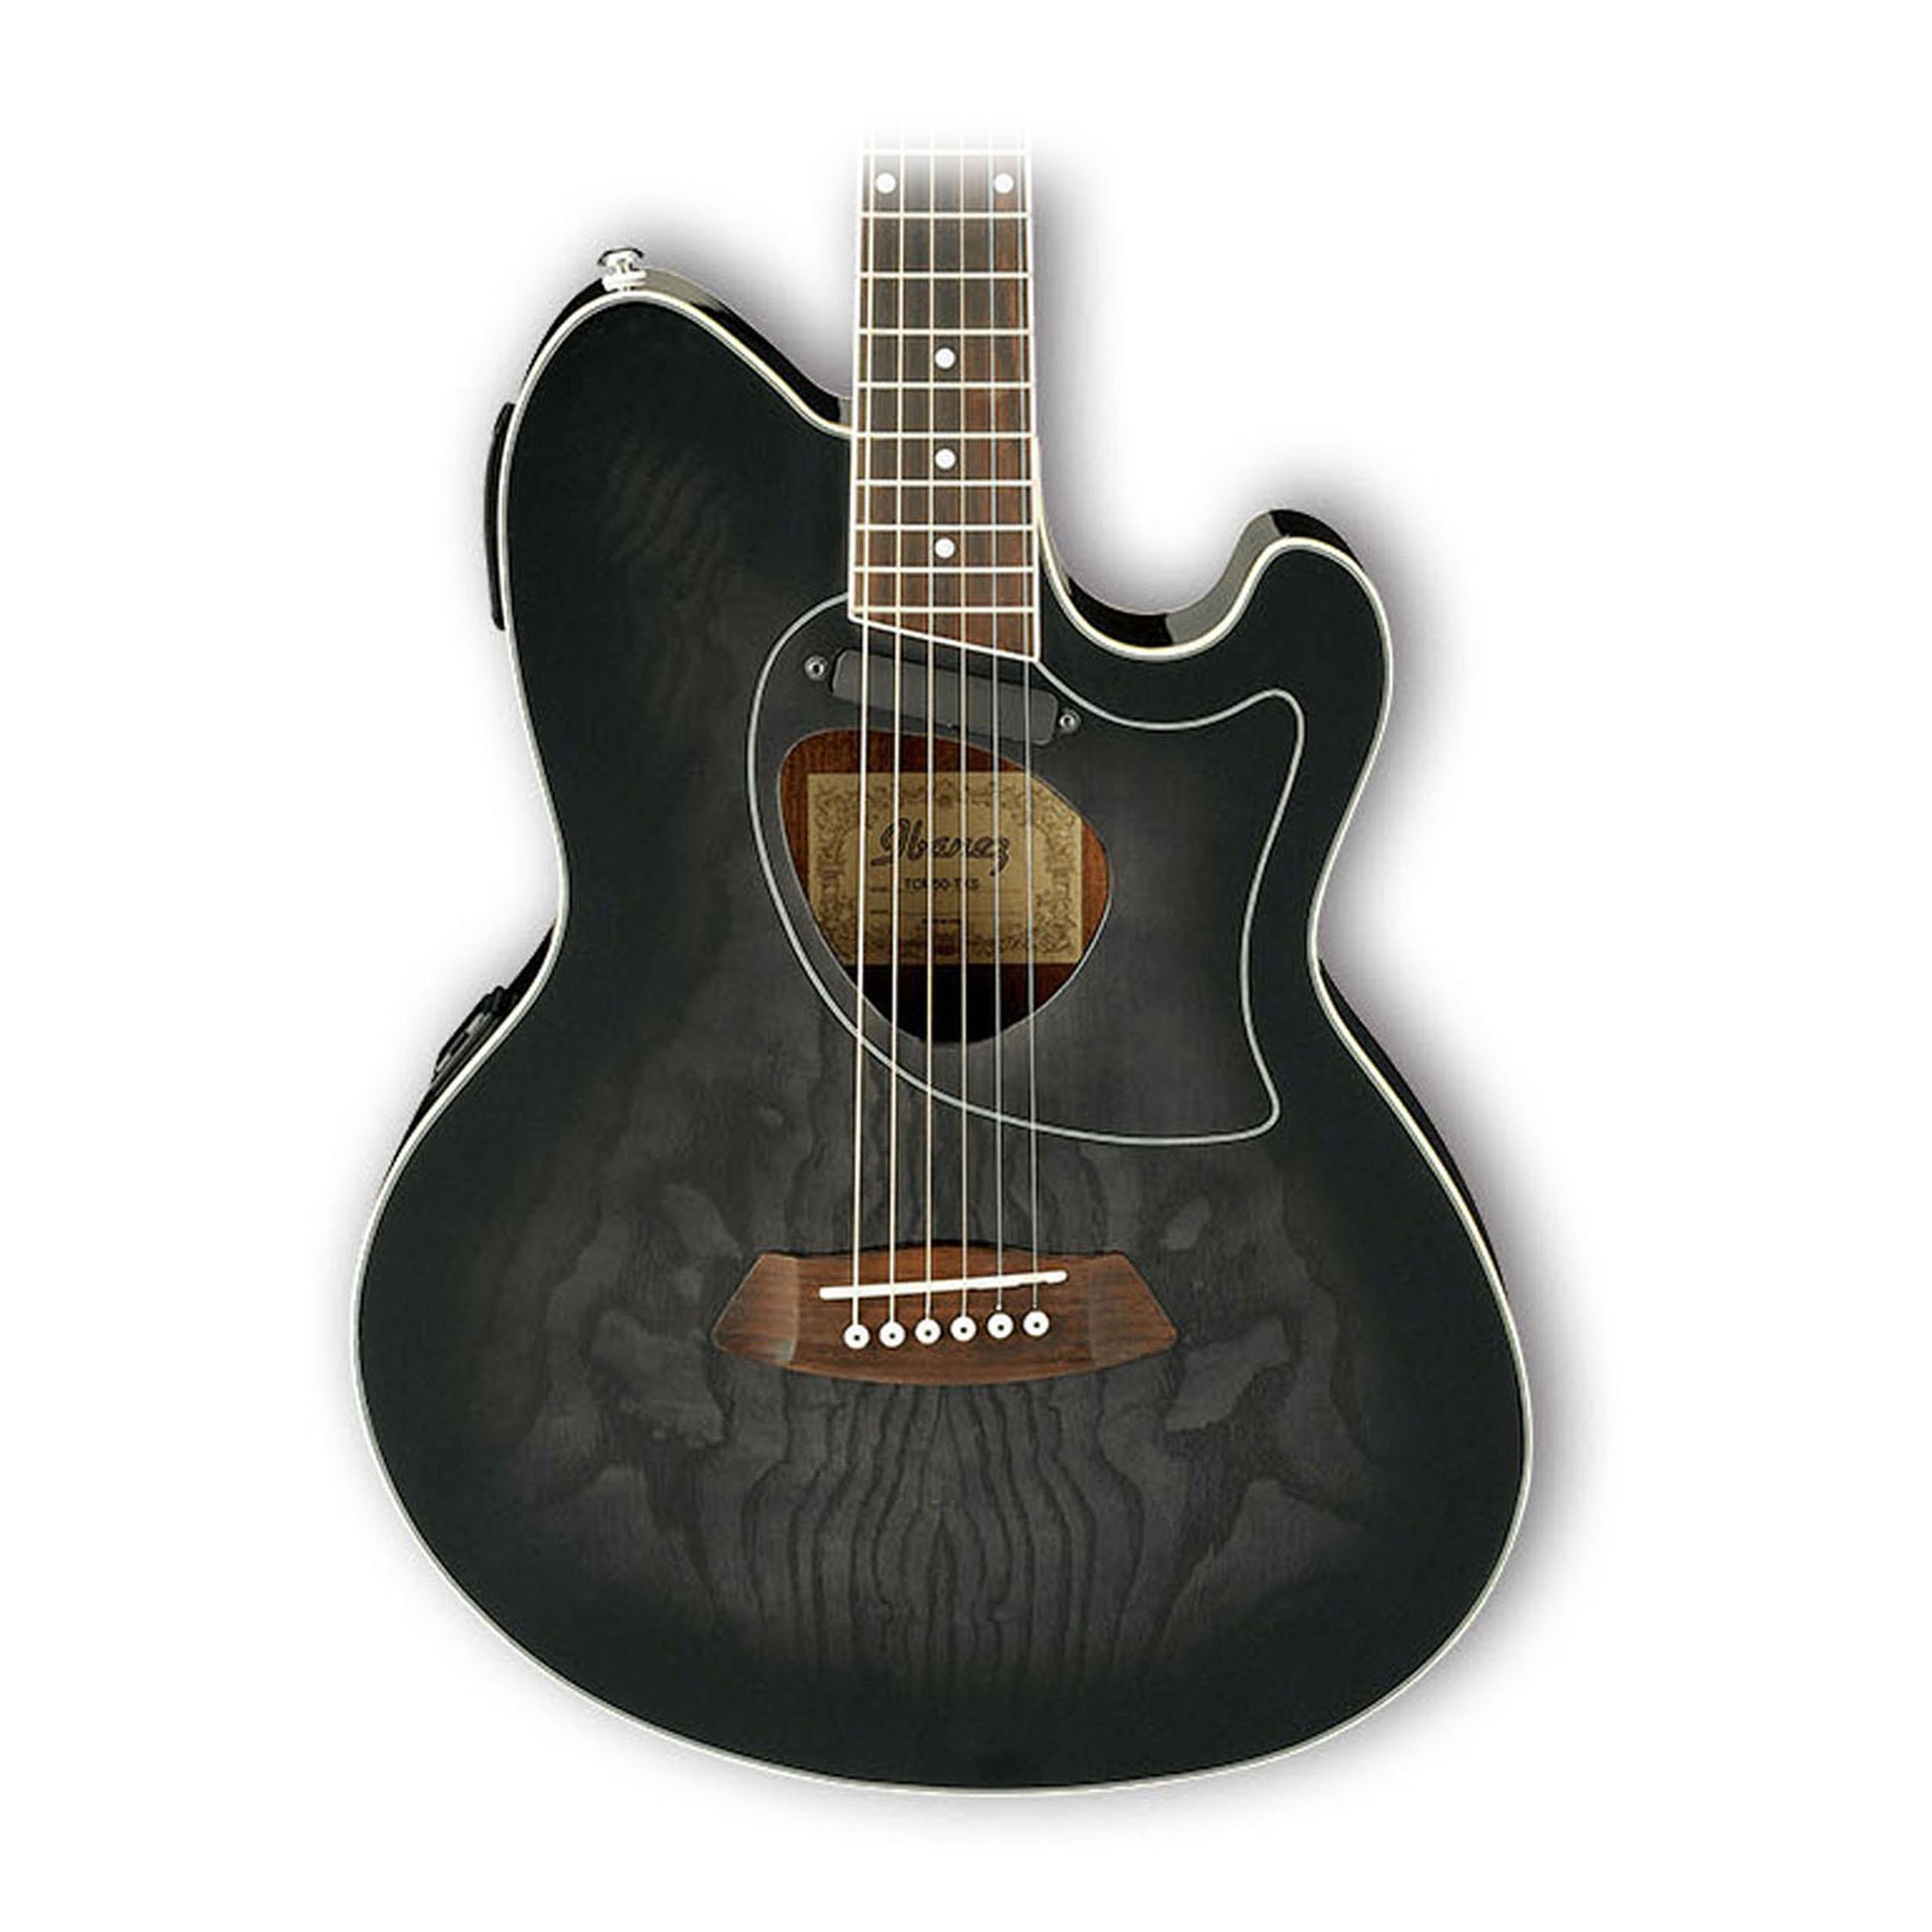 ibanez tcm50tks talman acoustic electric double cutaway transparent black ebay. Black Bedroom Furniture Sets. Home Design Ideas